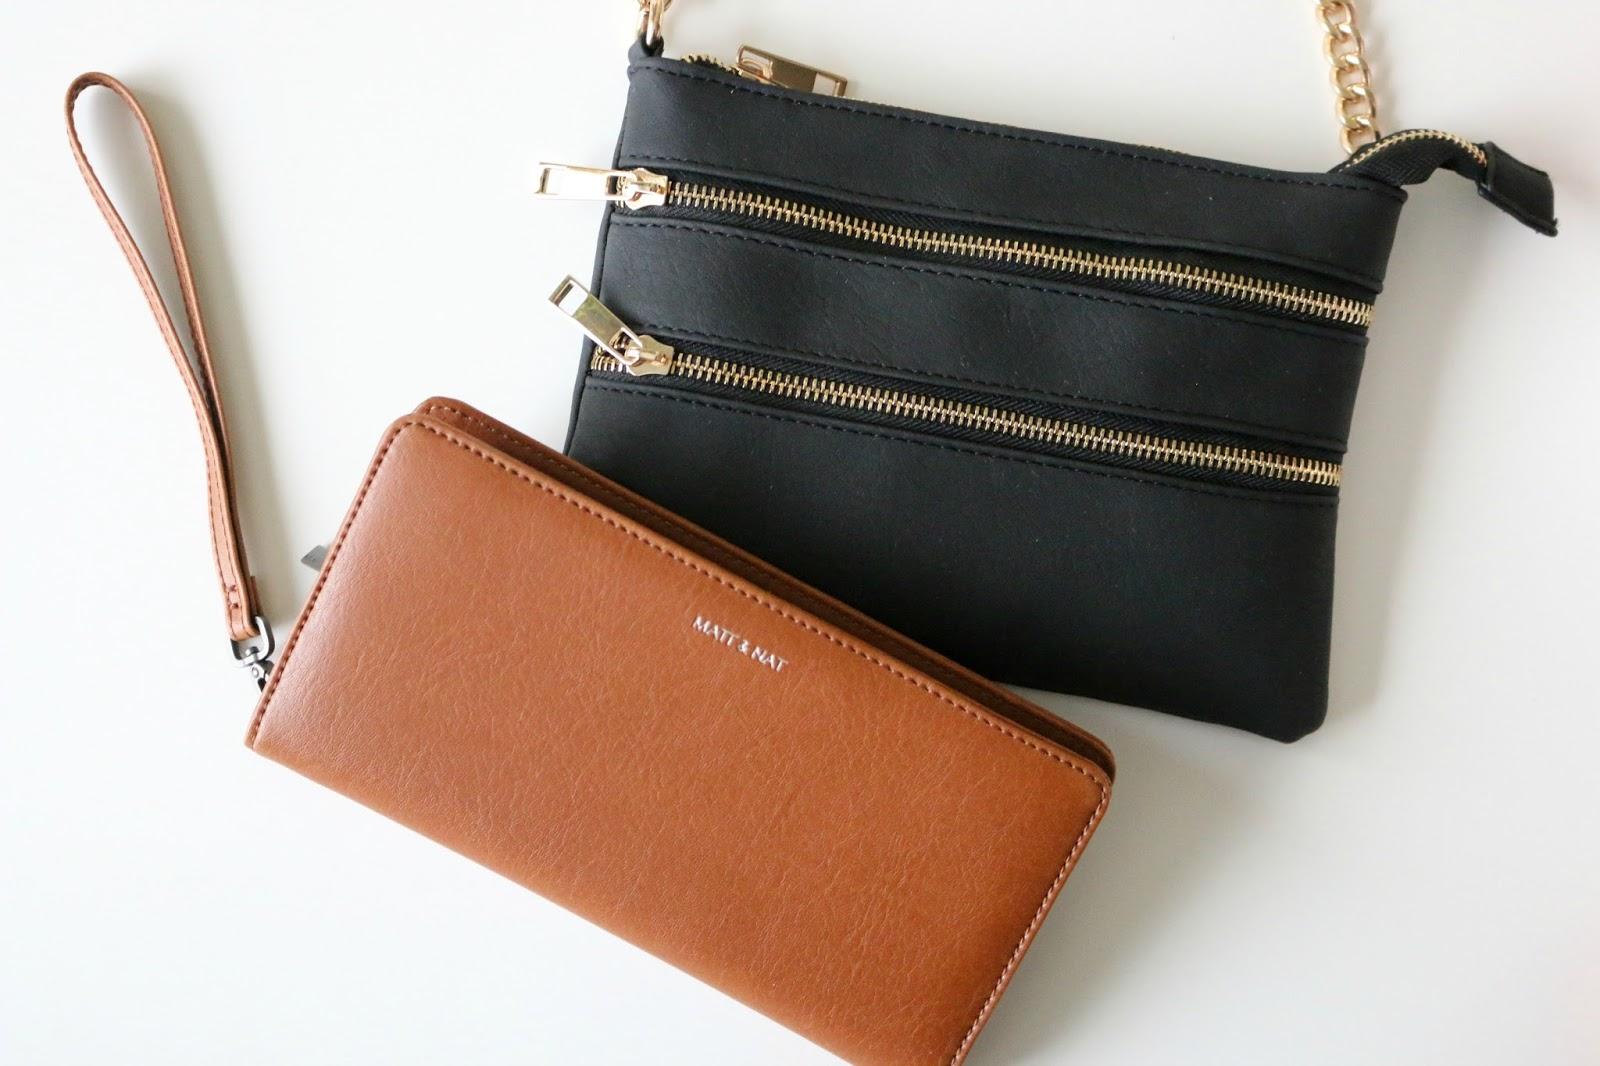 Matt & Nat Duma Chili Wallet Cross-Body Bag